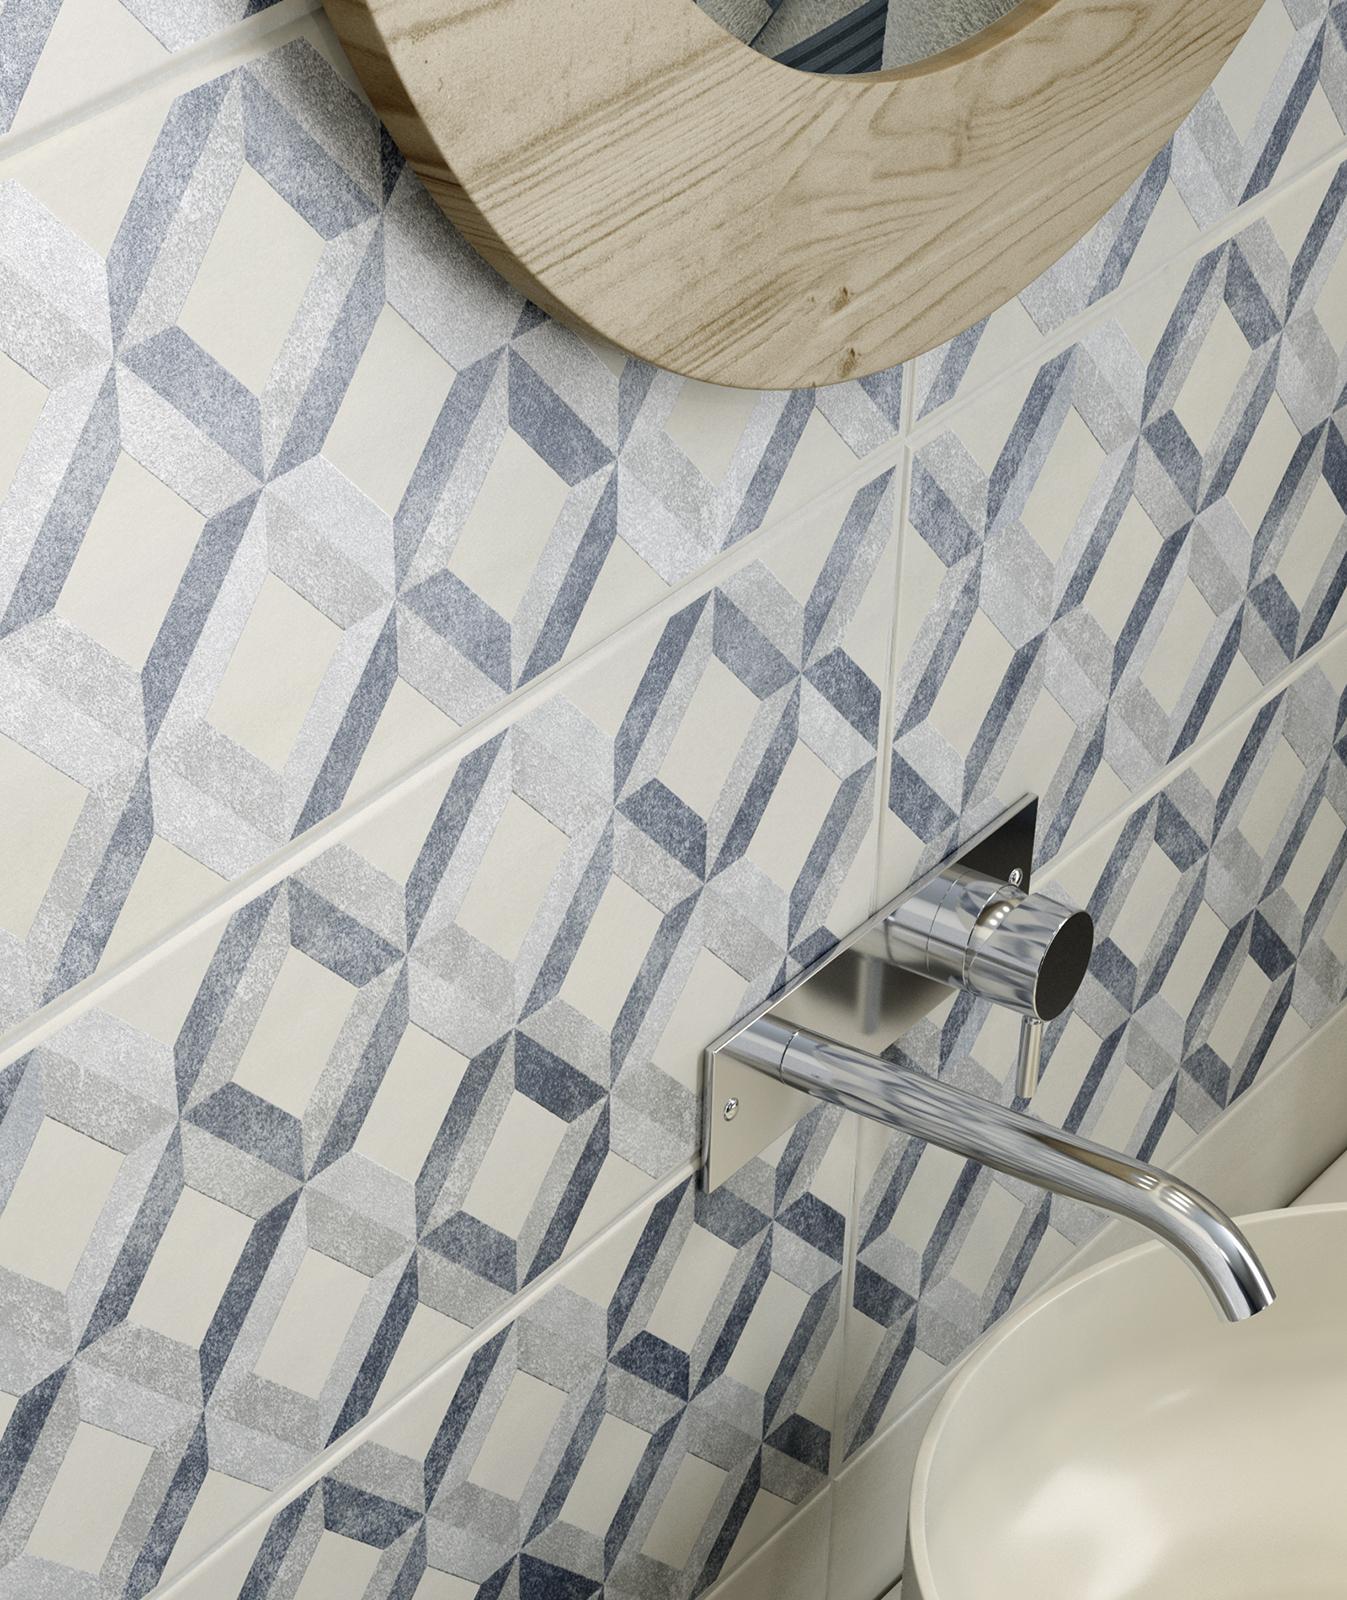 Paint kitchen and bathroom wall tiling marazzi paint ceramic tiles marazzi7079 doublecrazyfo Image collections